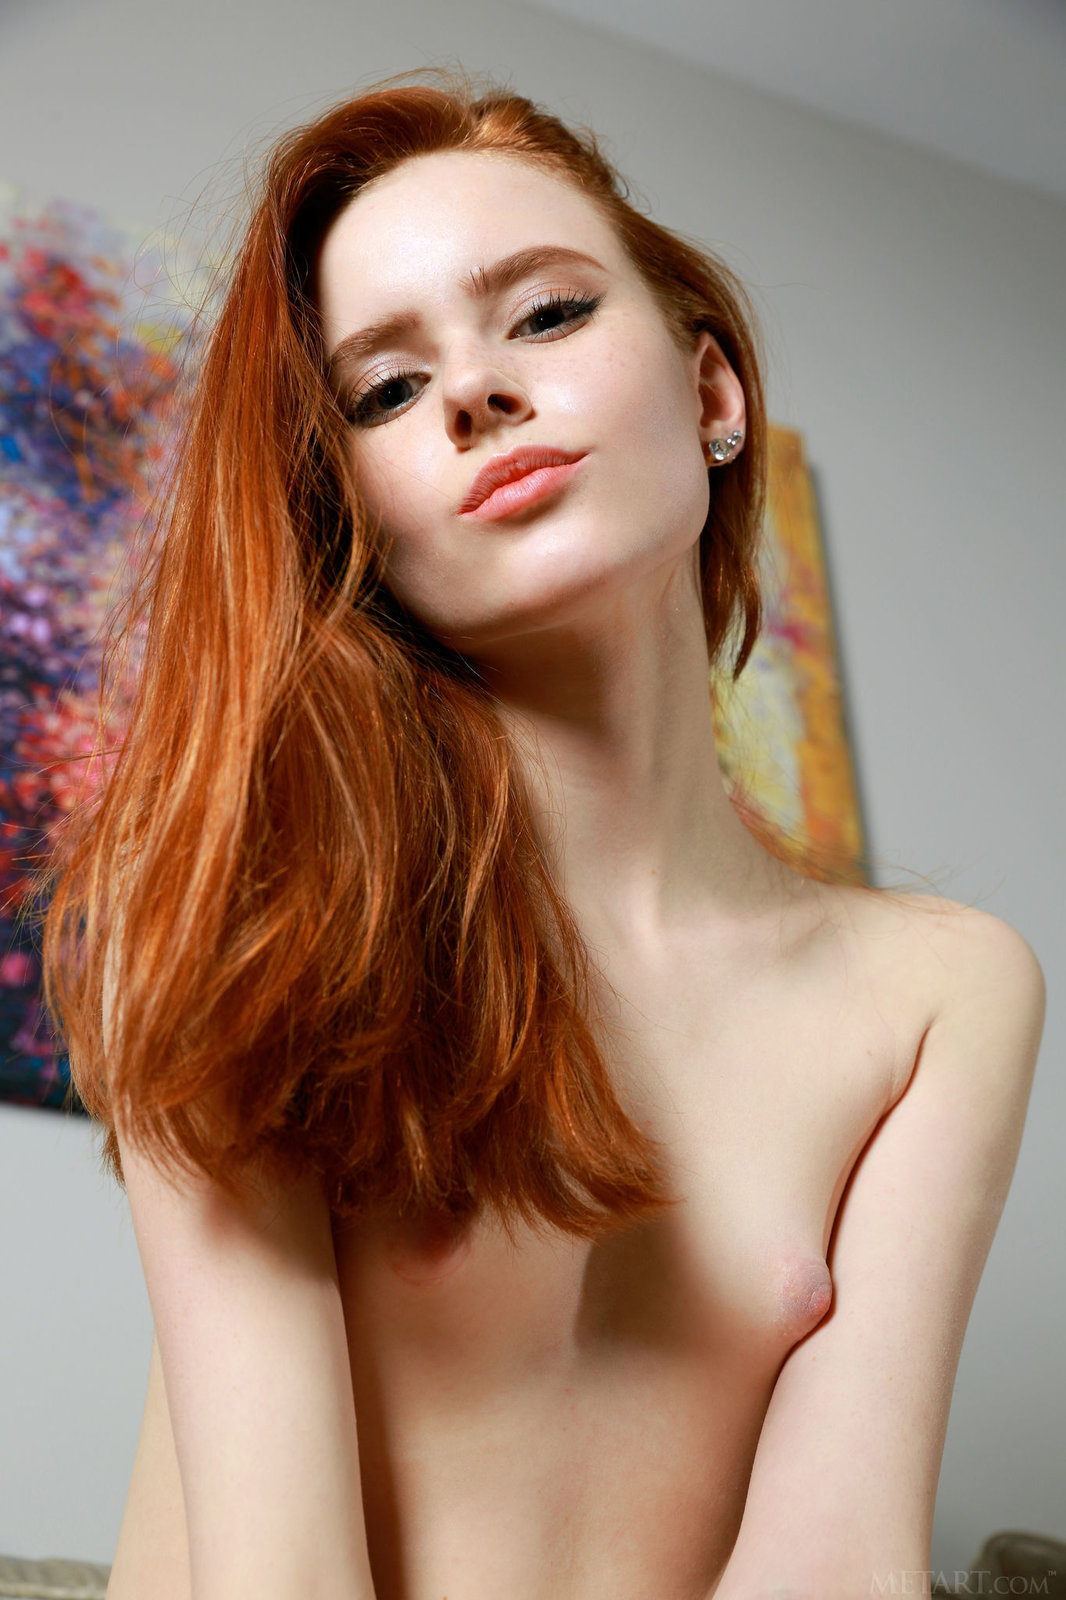 Bella Milano in Encia by MetArt 16 photos  Erotic Beauties